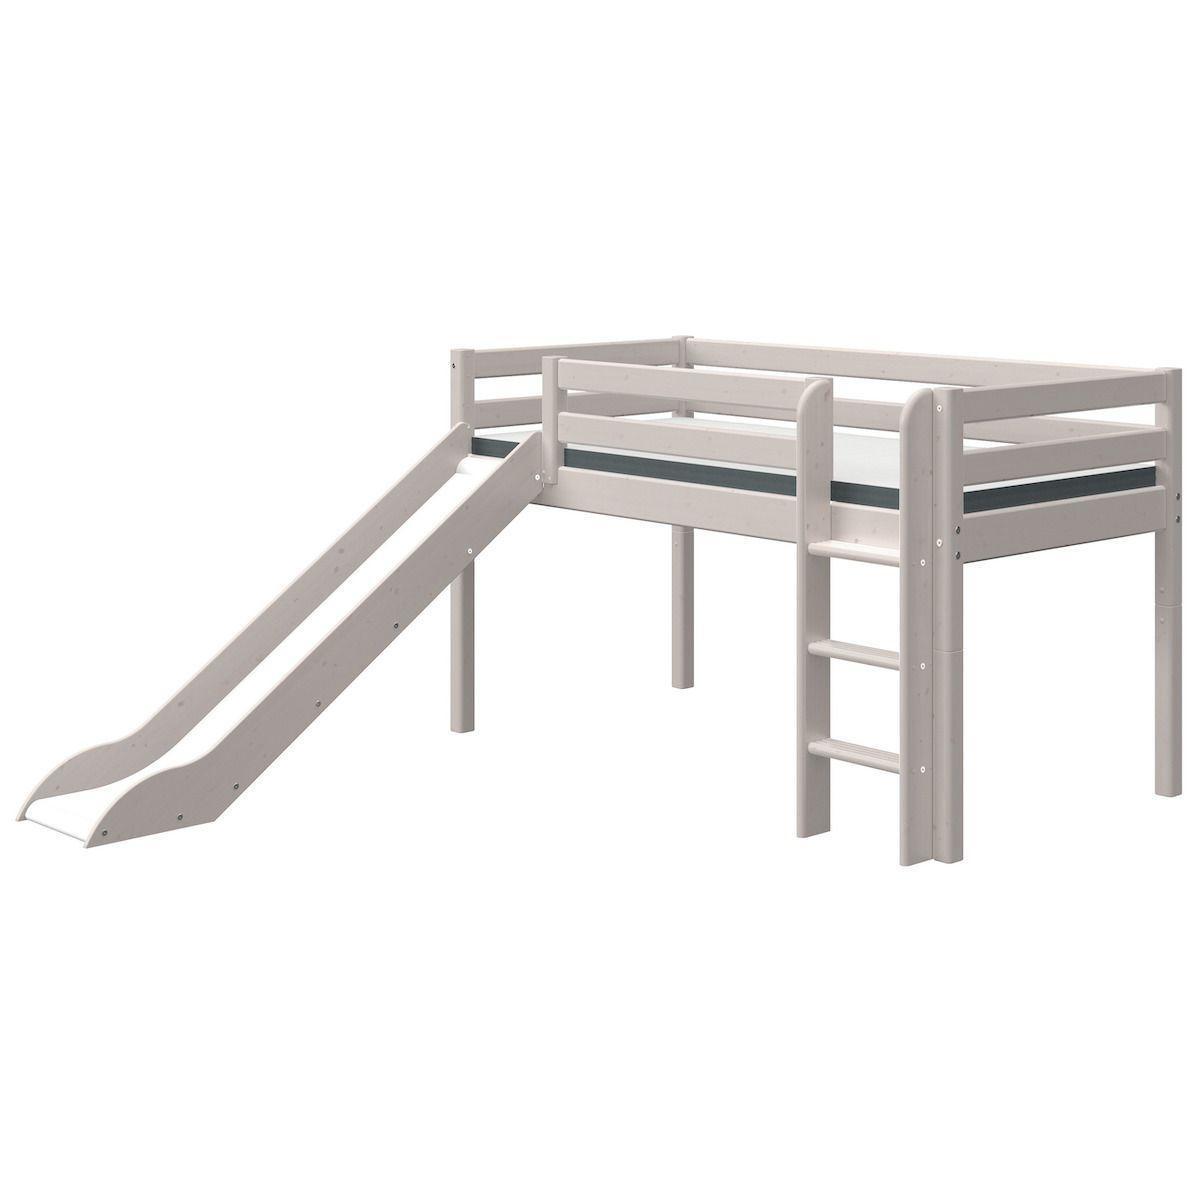 Cama media alta 90x200cm escalera recta-tobogán CLASSIC Flexa grey washed